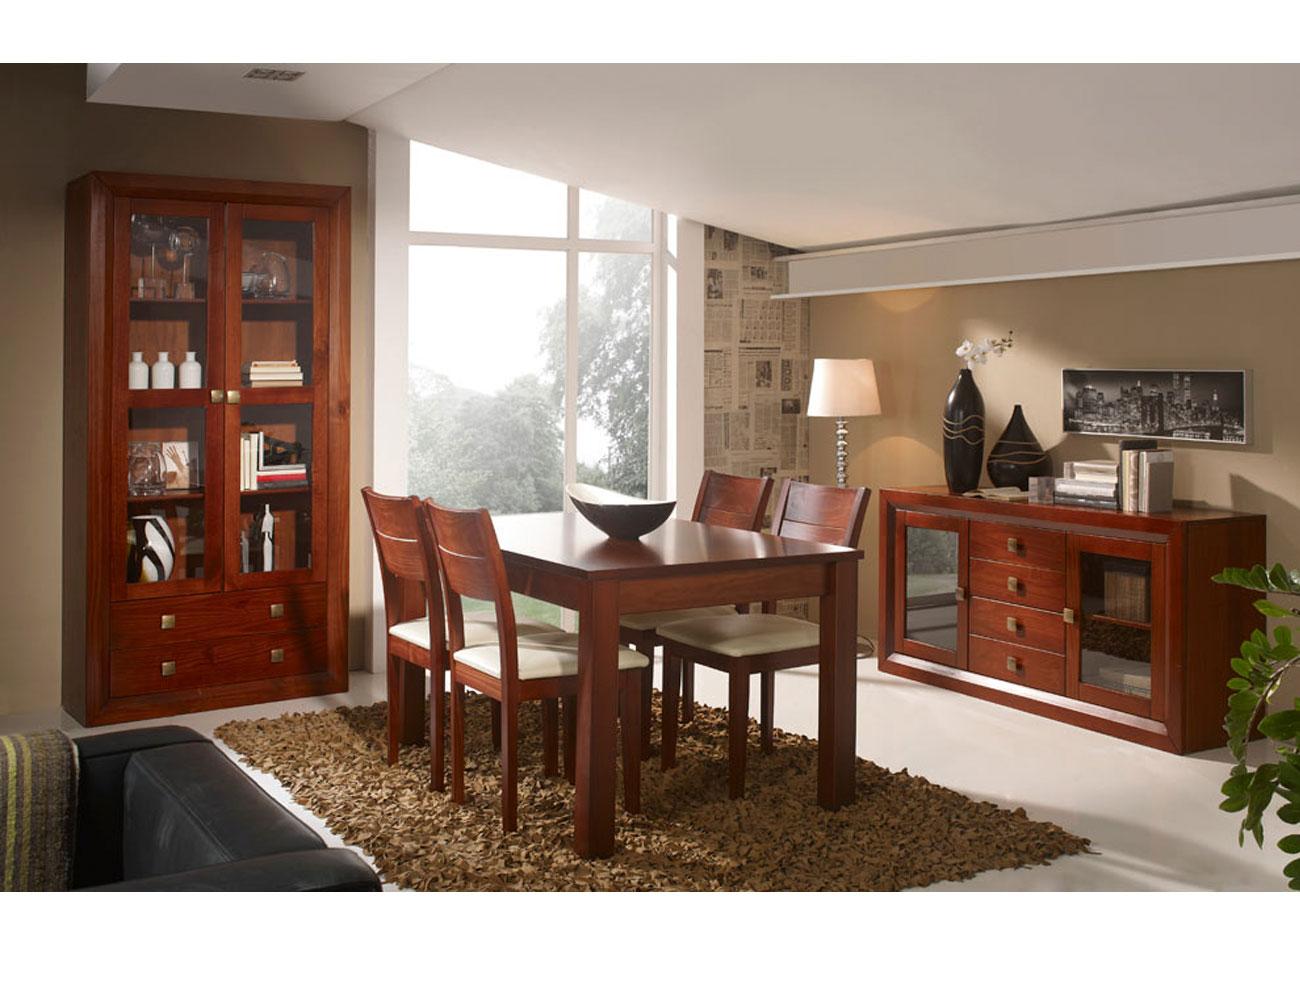 Muebles salon comedor nogal madera dm vitrina aparador mesa extensible sillas